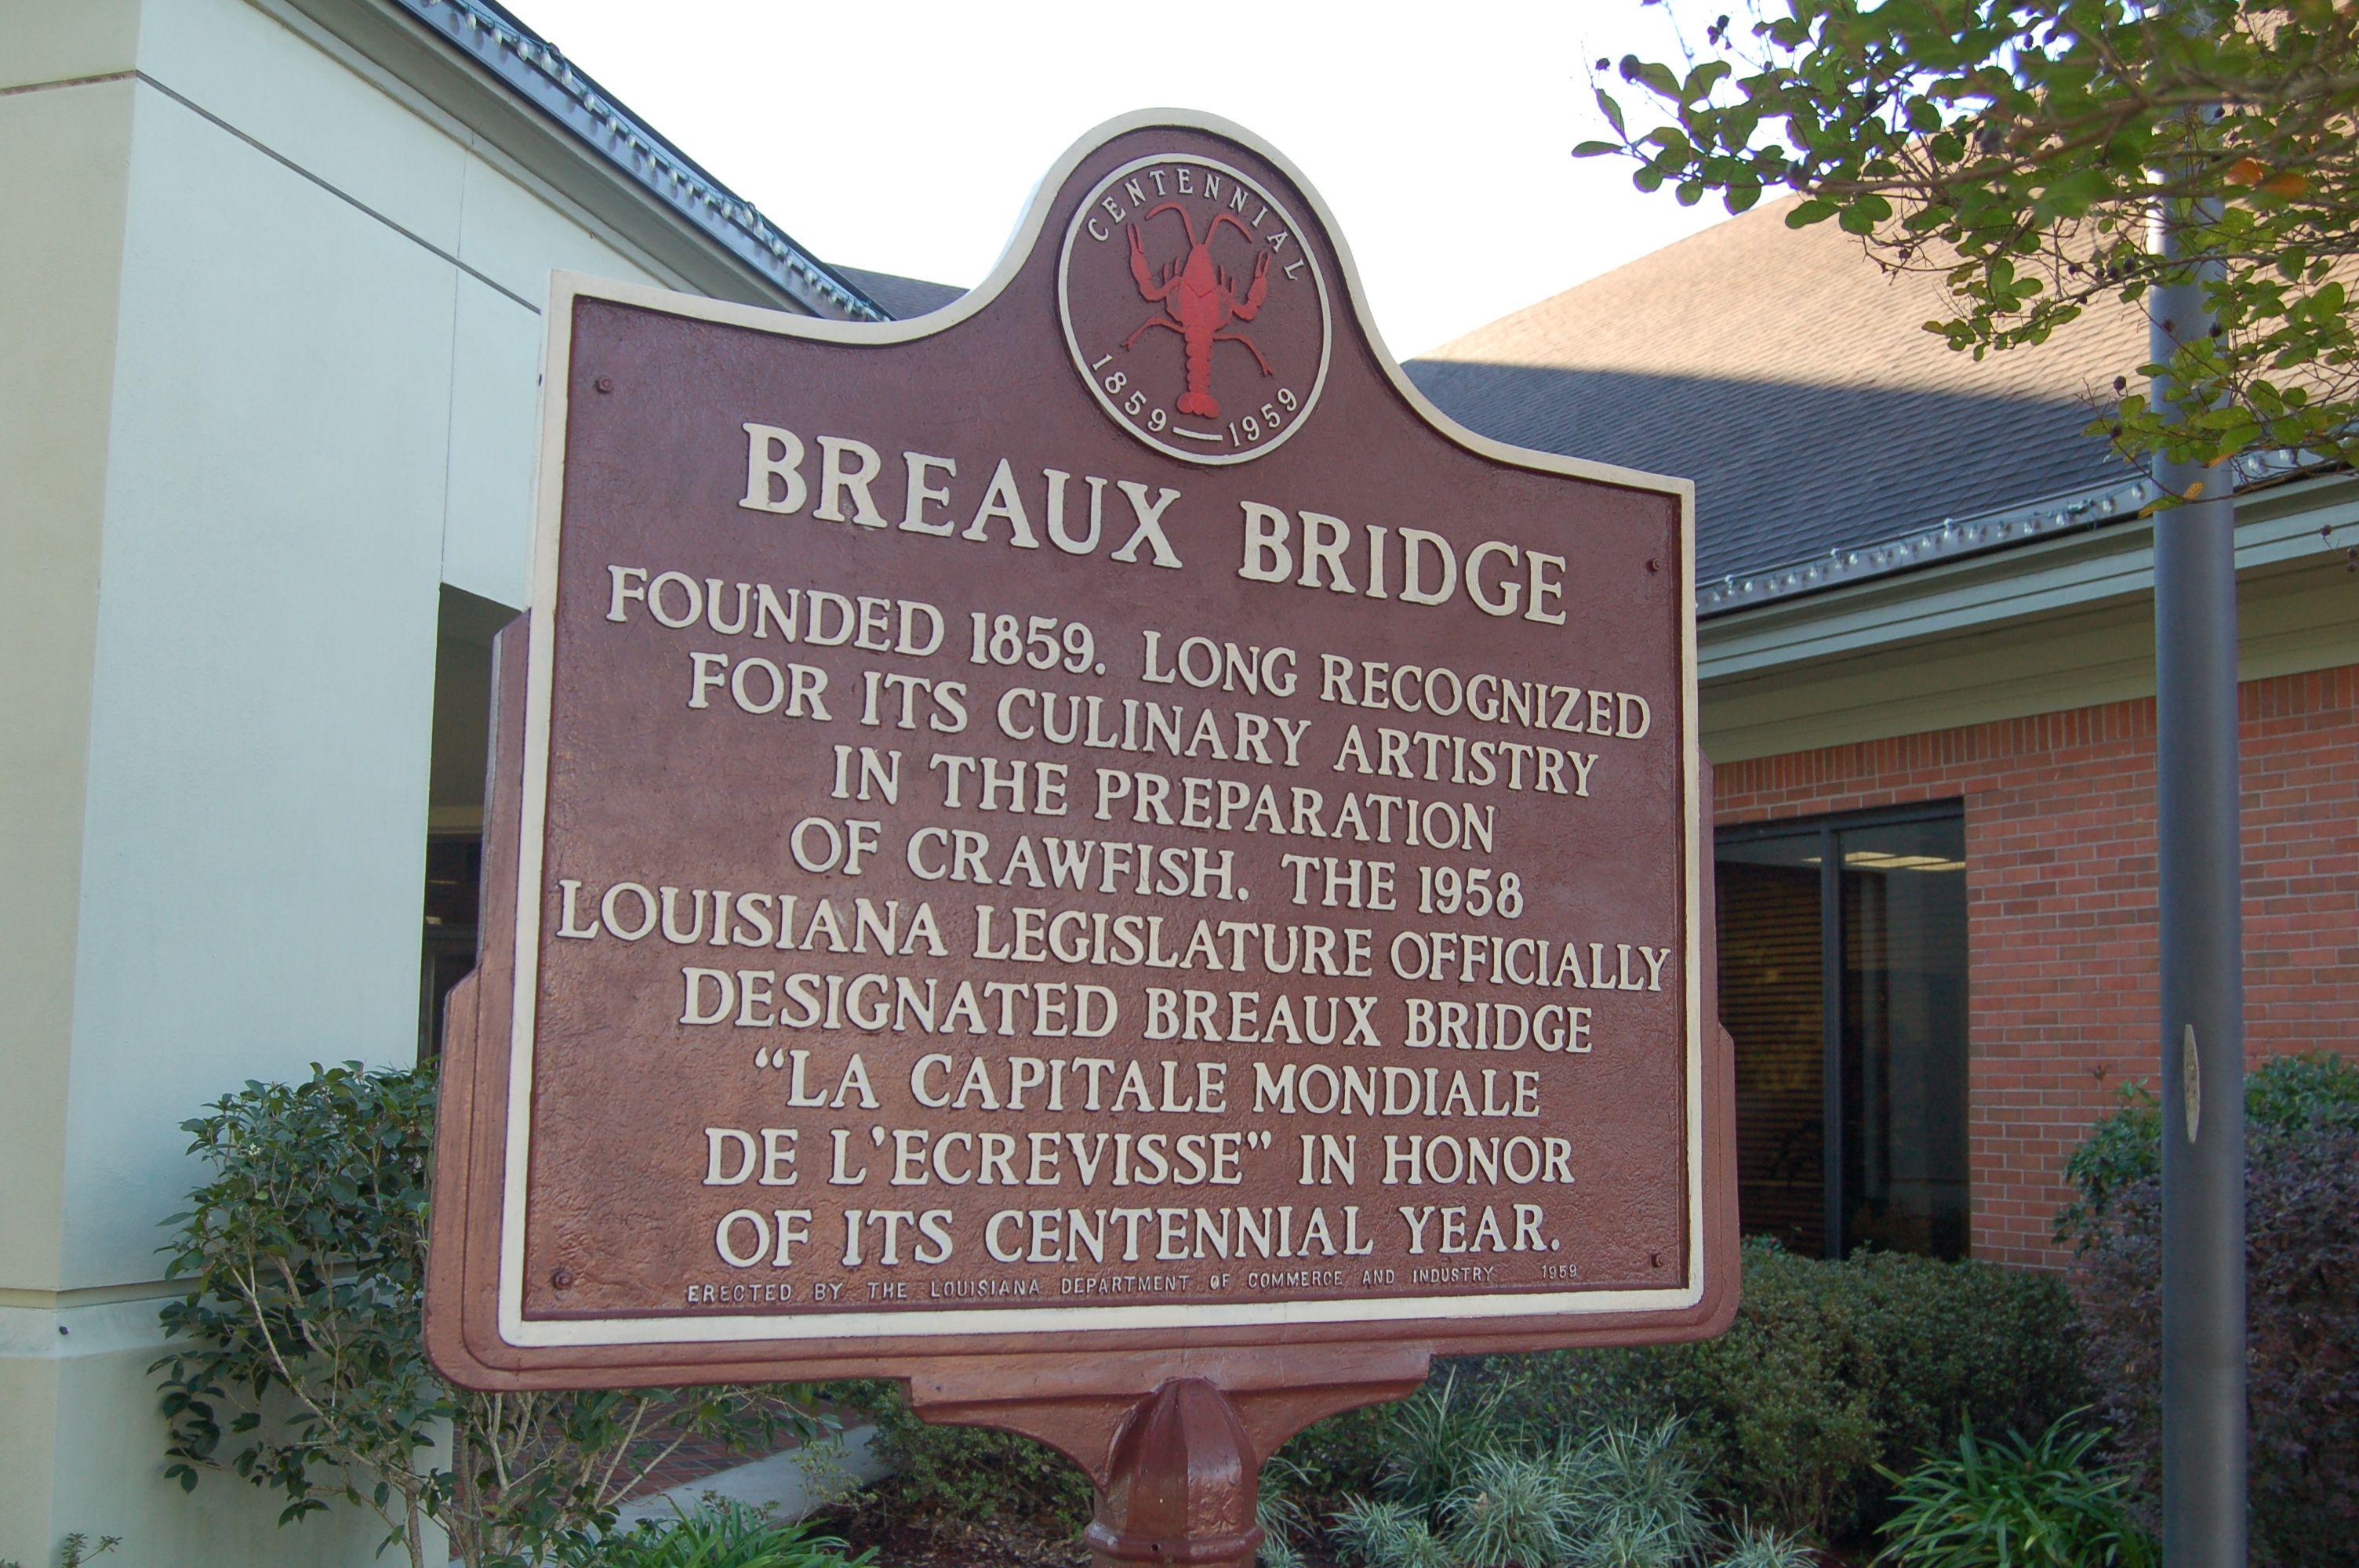 Breaux Bridge English Breaux Bridge St Martin Parish Lousiaia Louisiana History Historical Marker Breaux Bridge